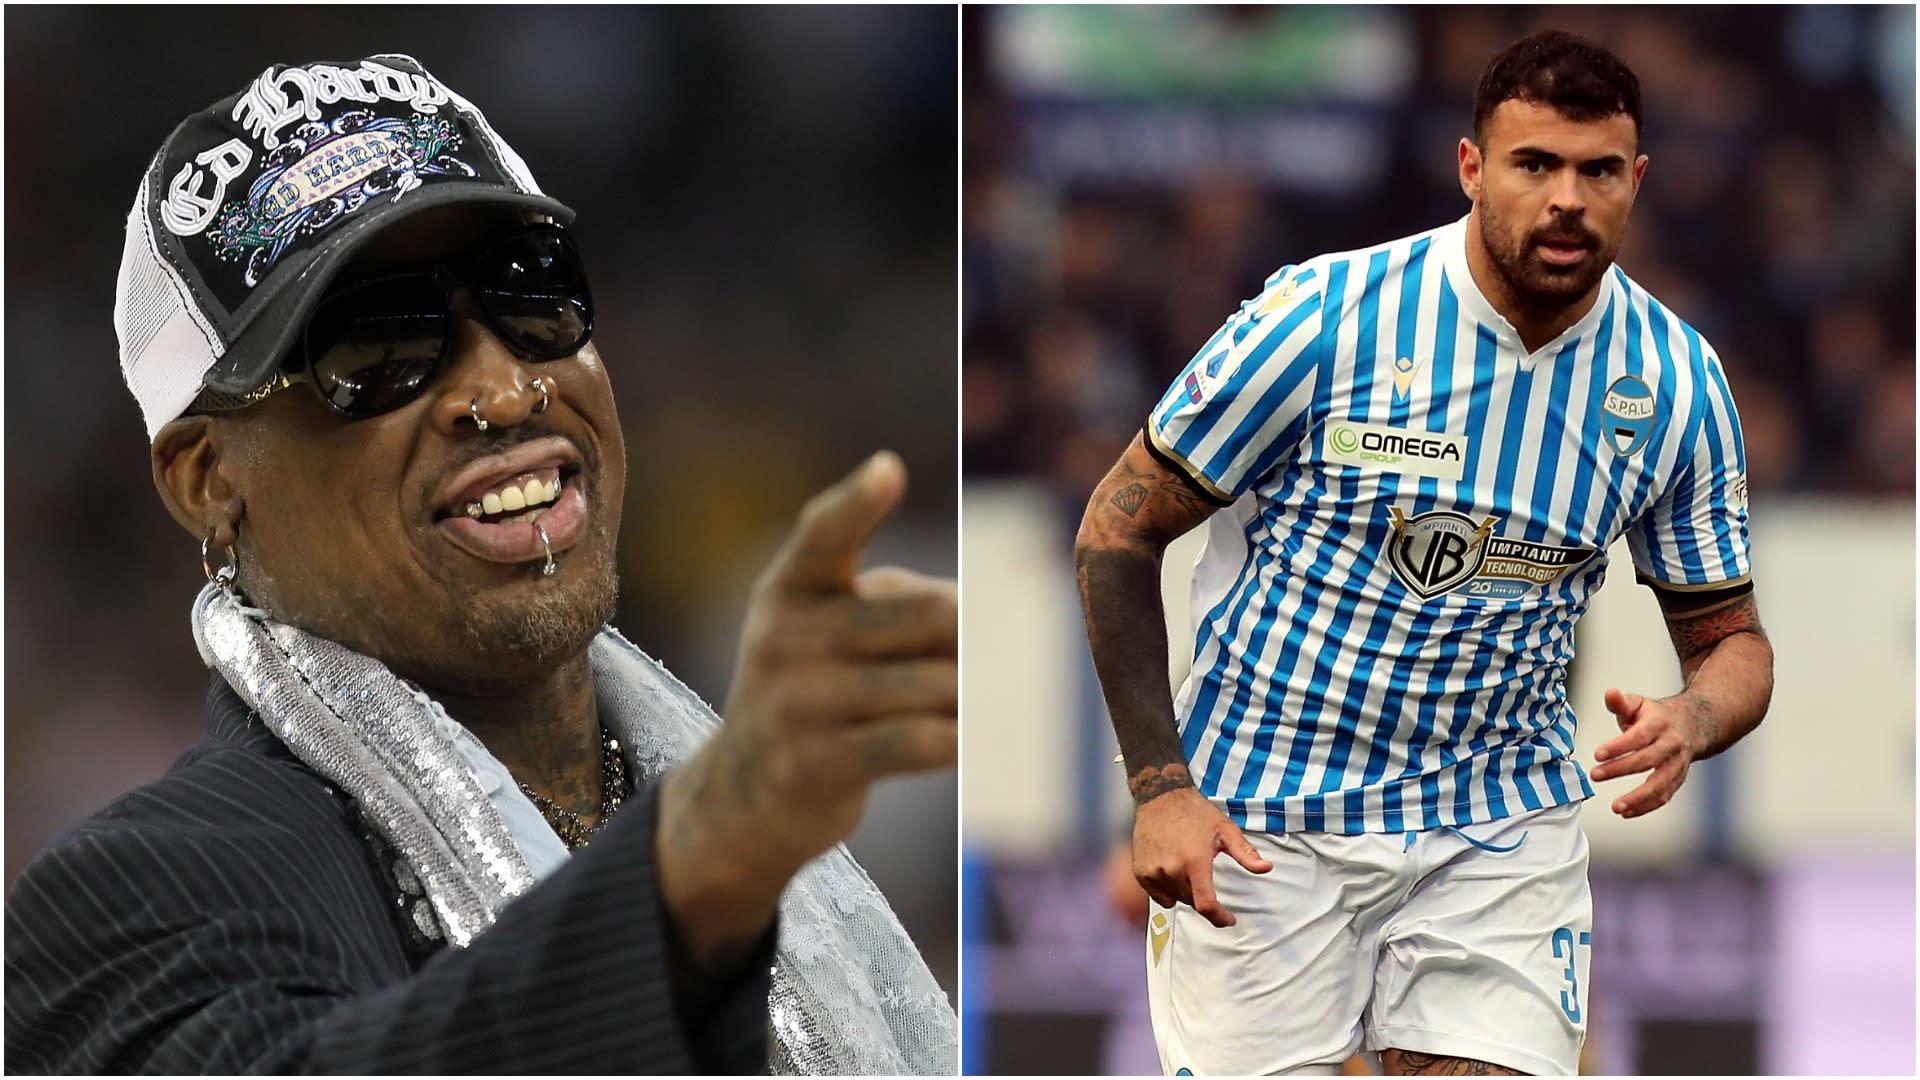 Bulls legend Rodman makes comical gaffe in video to SPAL striker Petagna